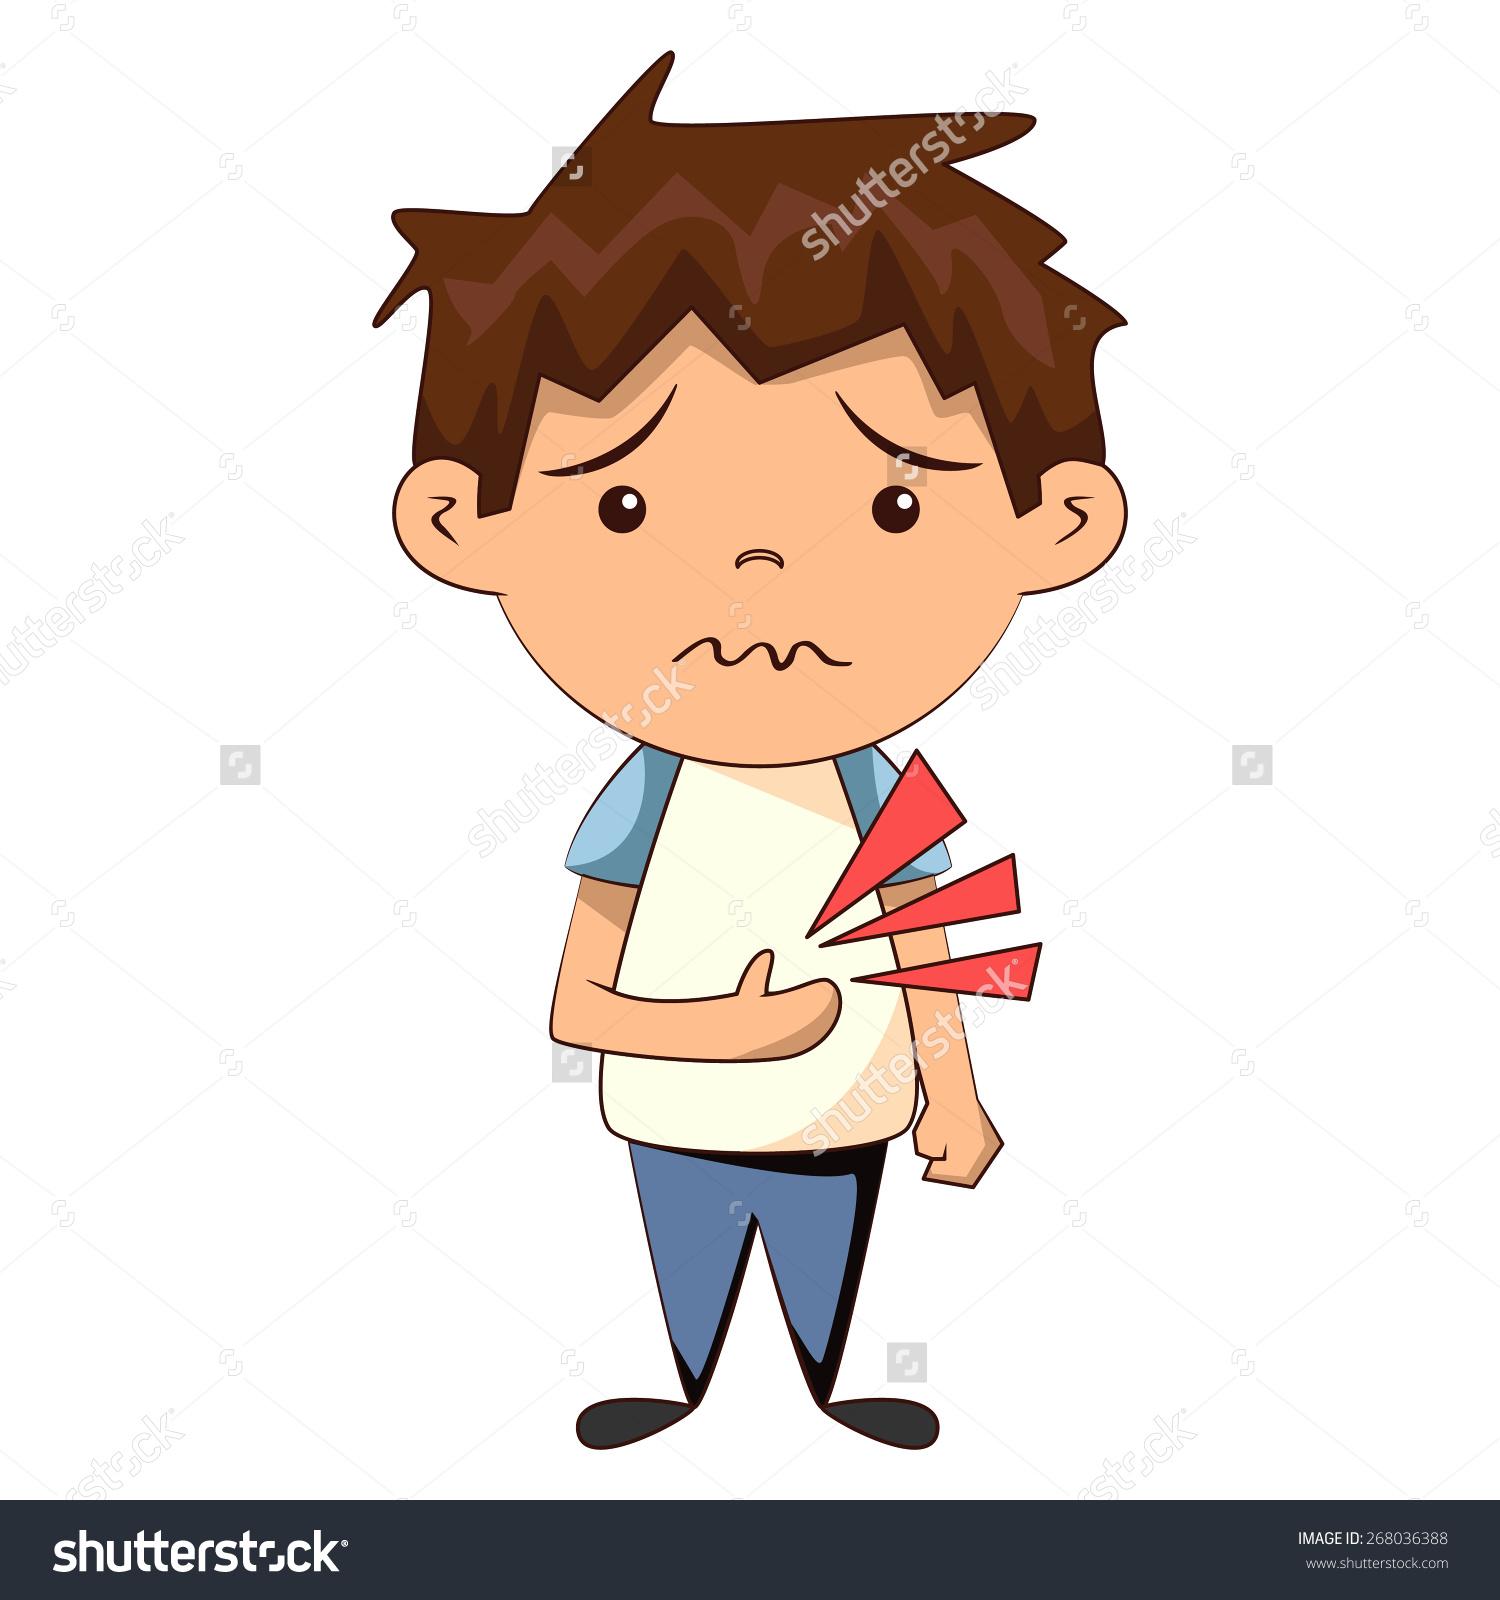 Kid stomach ache clipart.